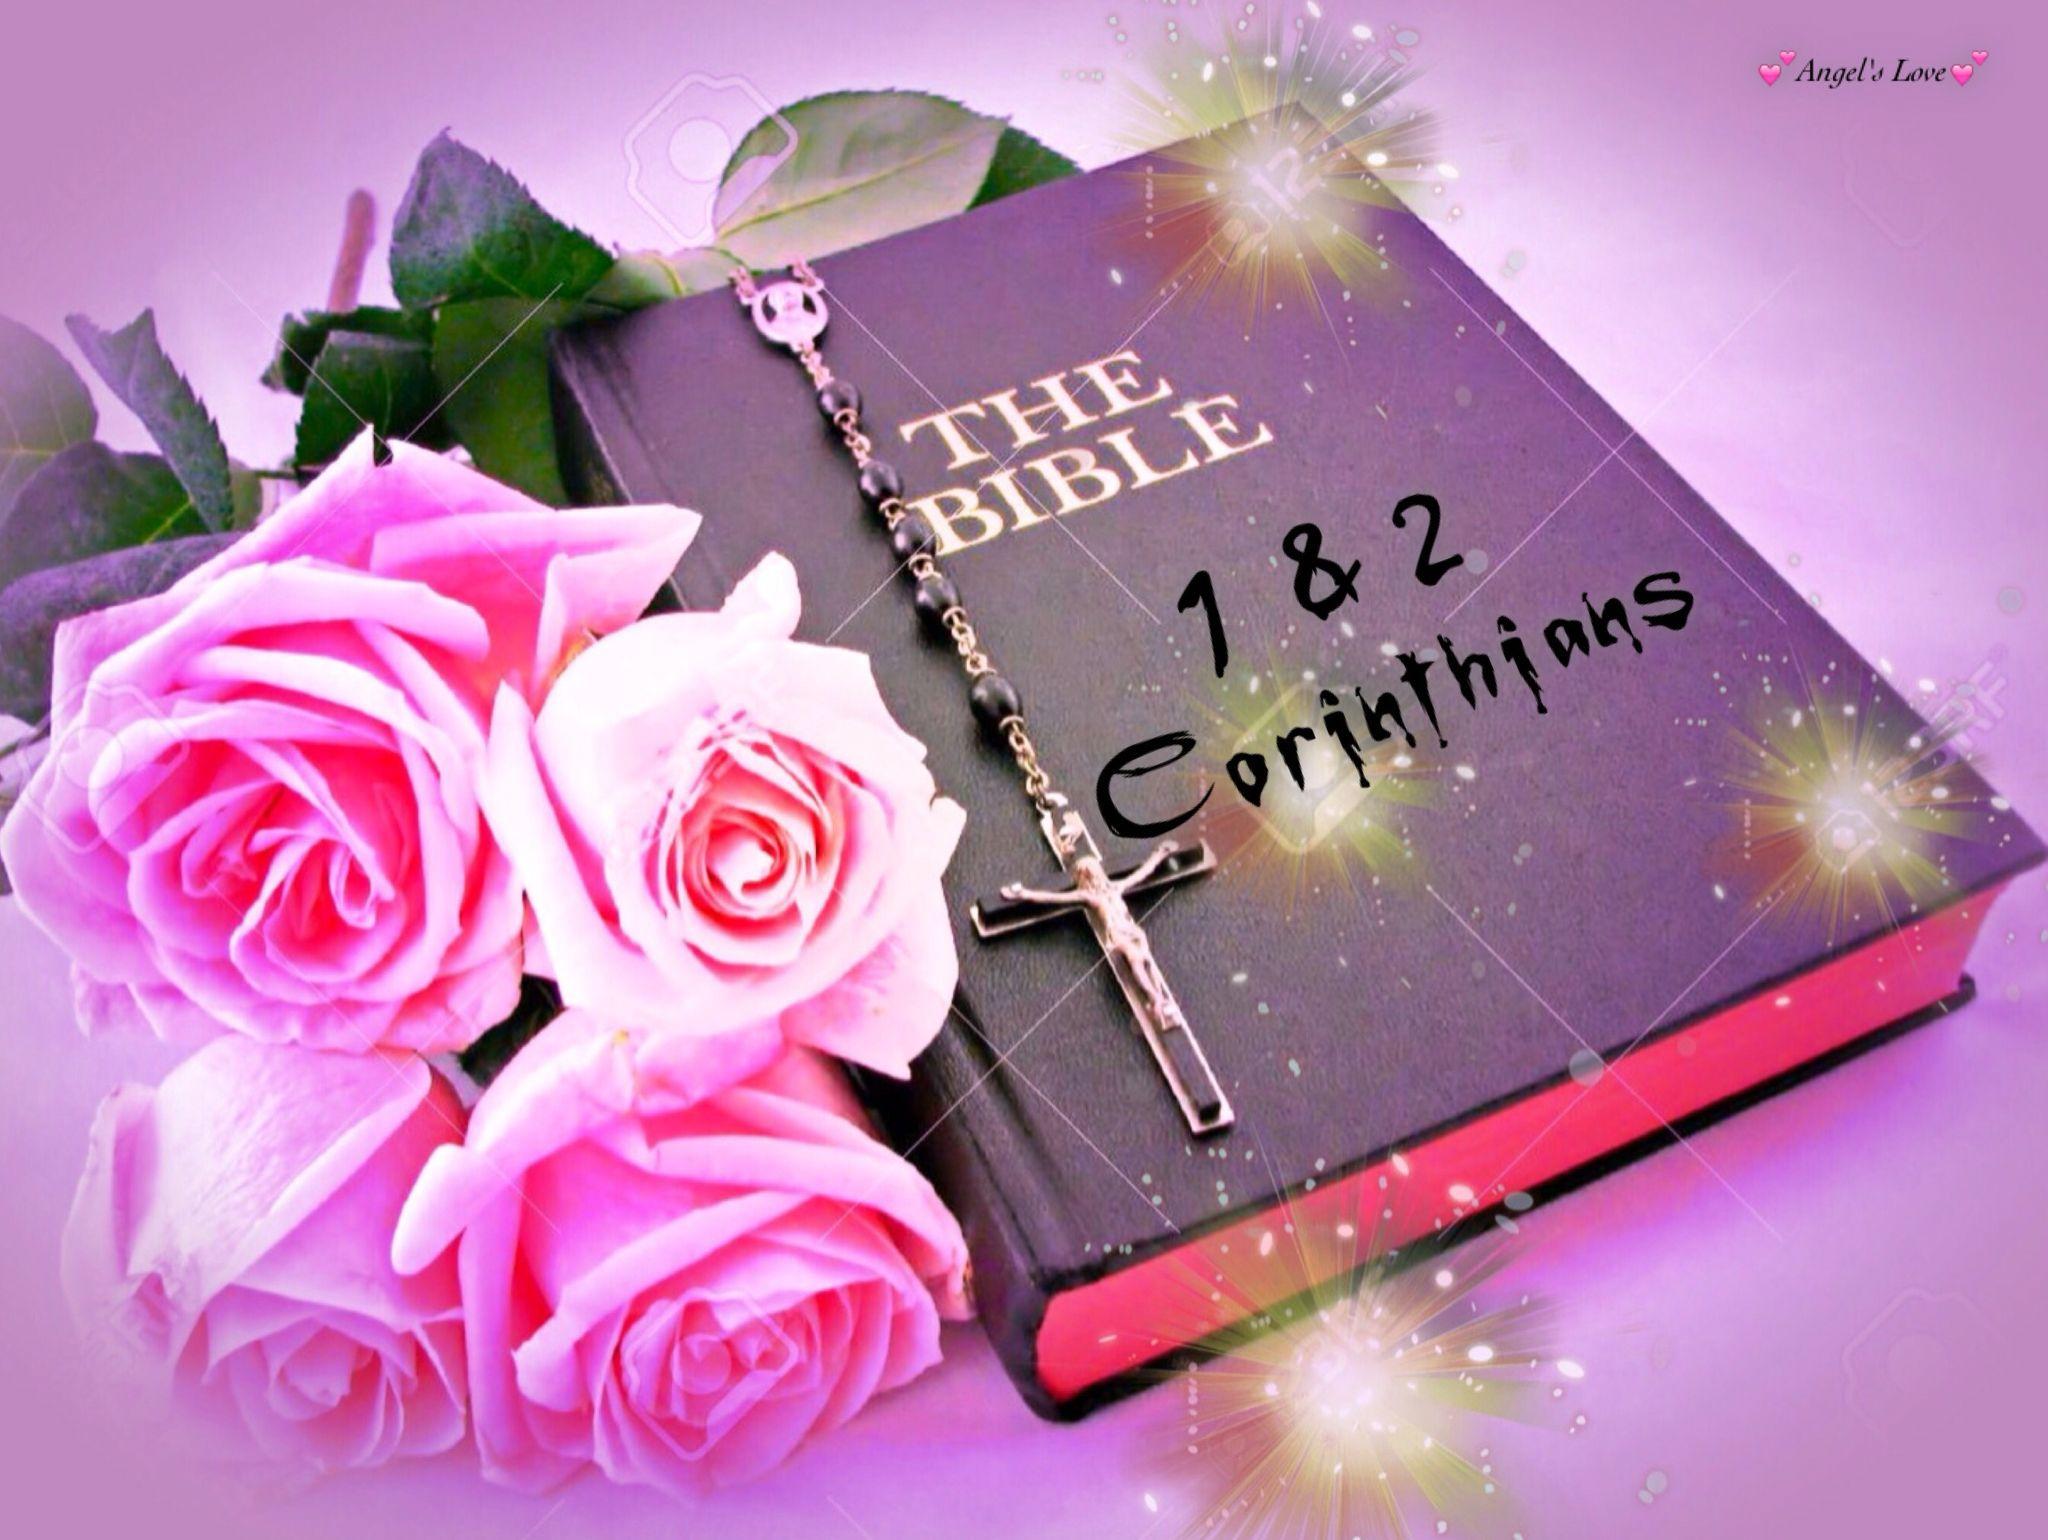 Bible Scripture from 1 & 2 Corinthians